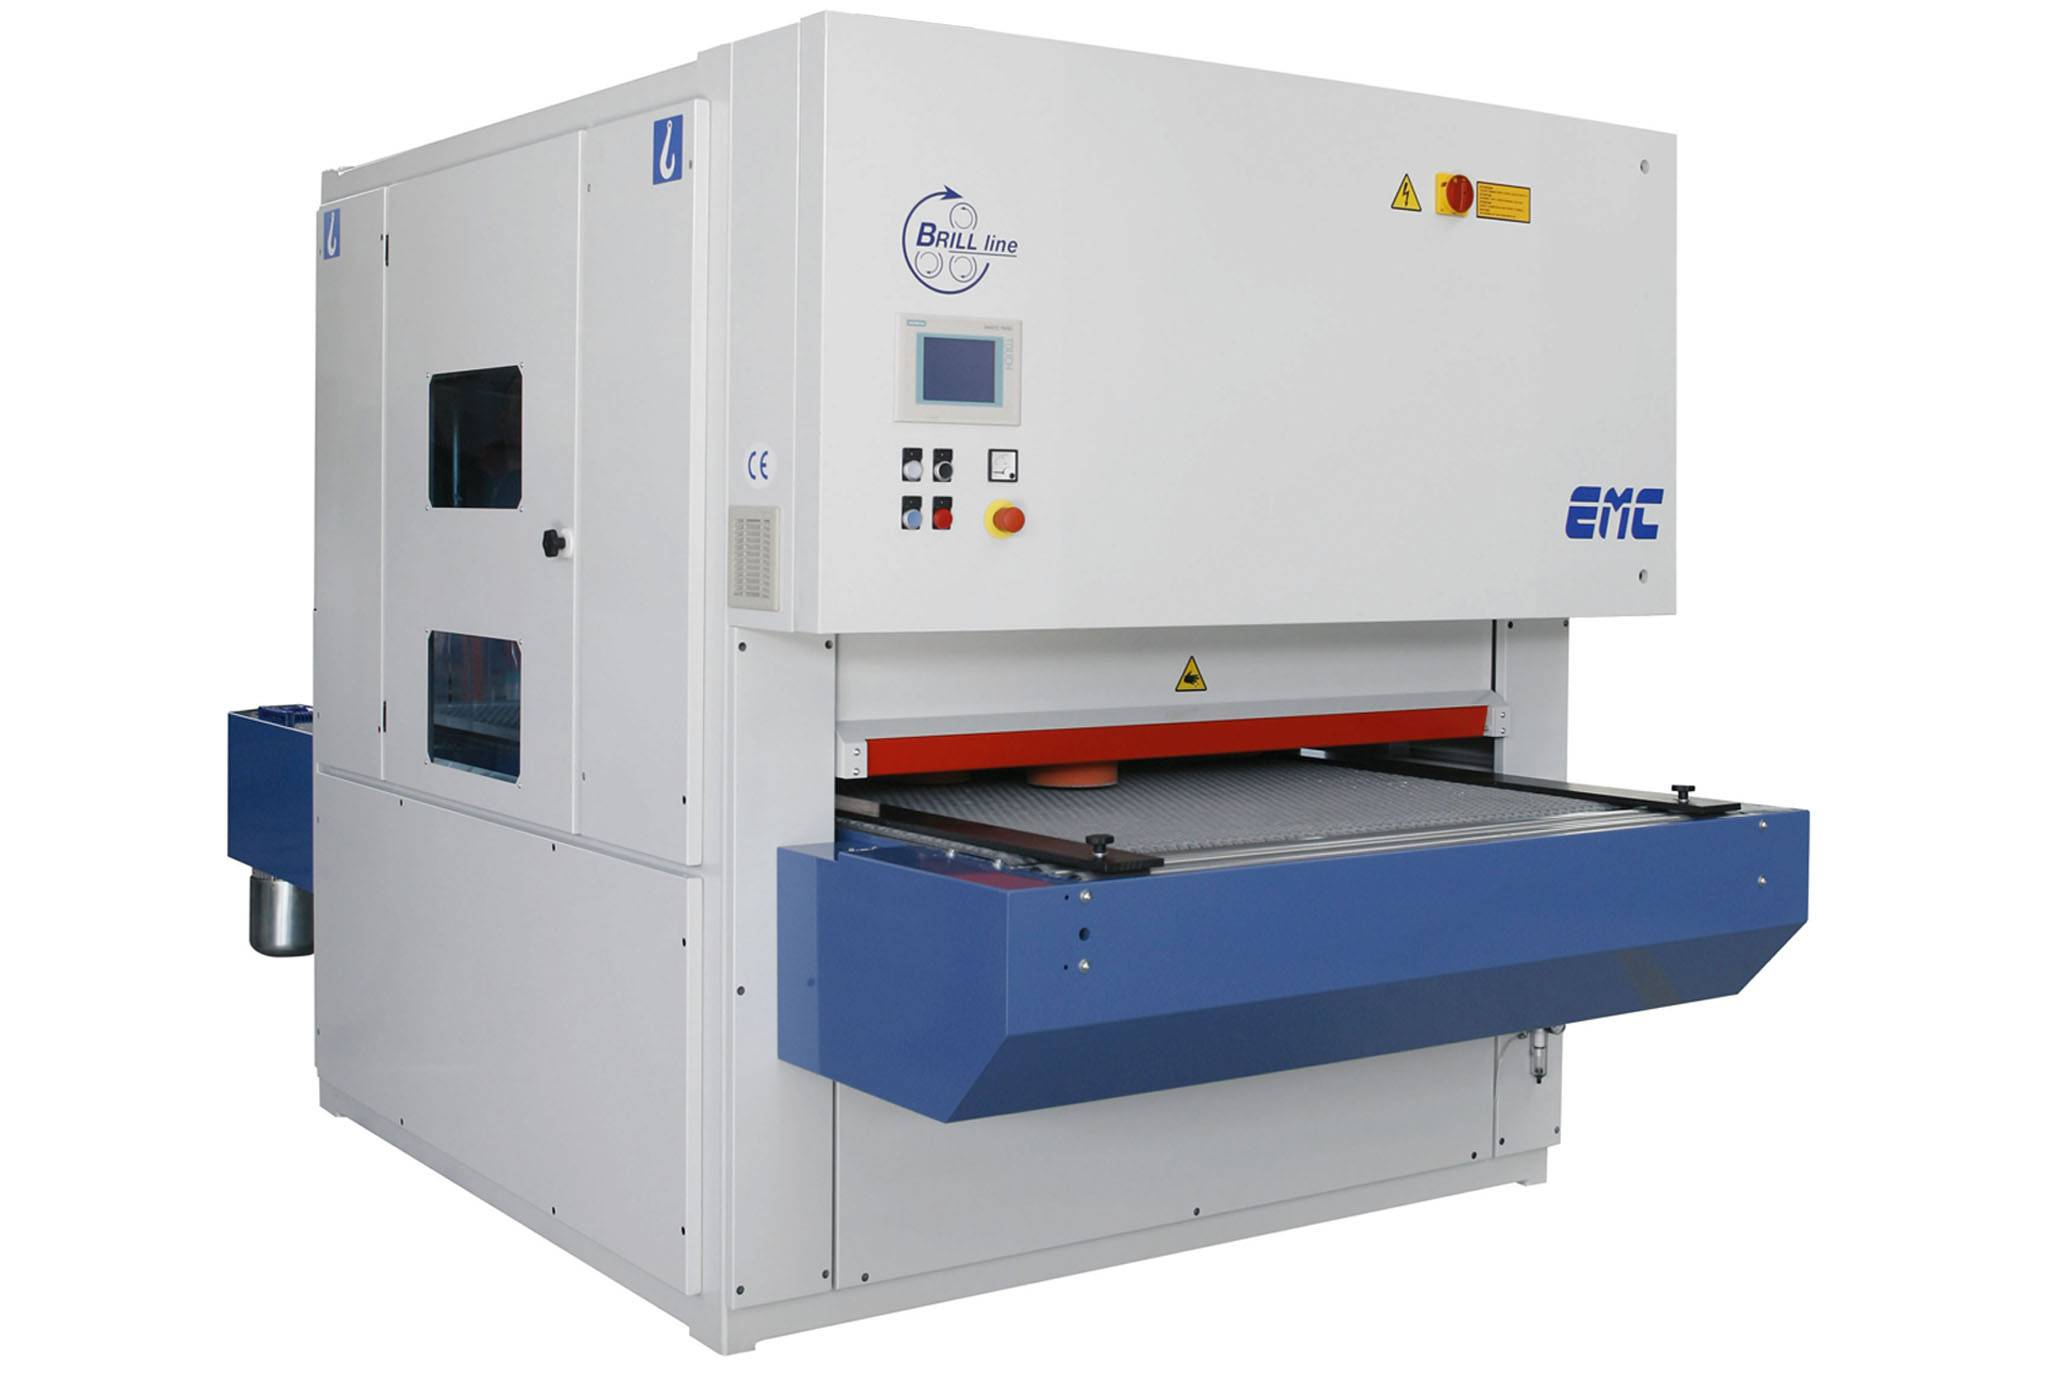 EMC | Rotoplus 1350 Brill